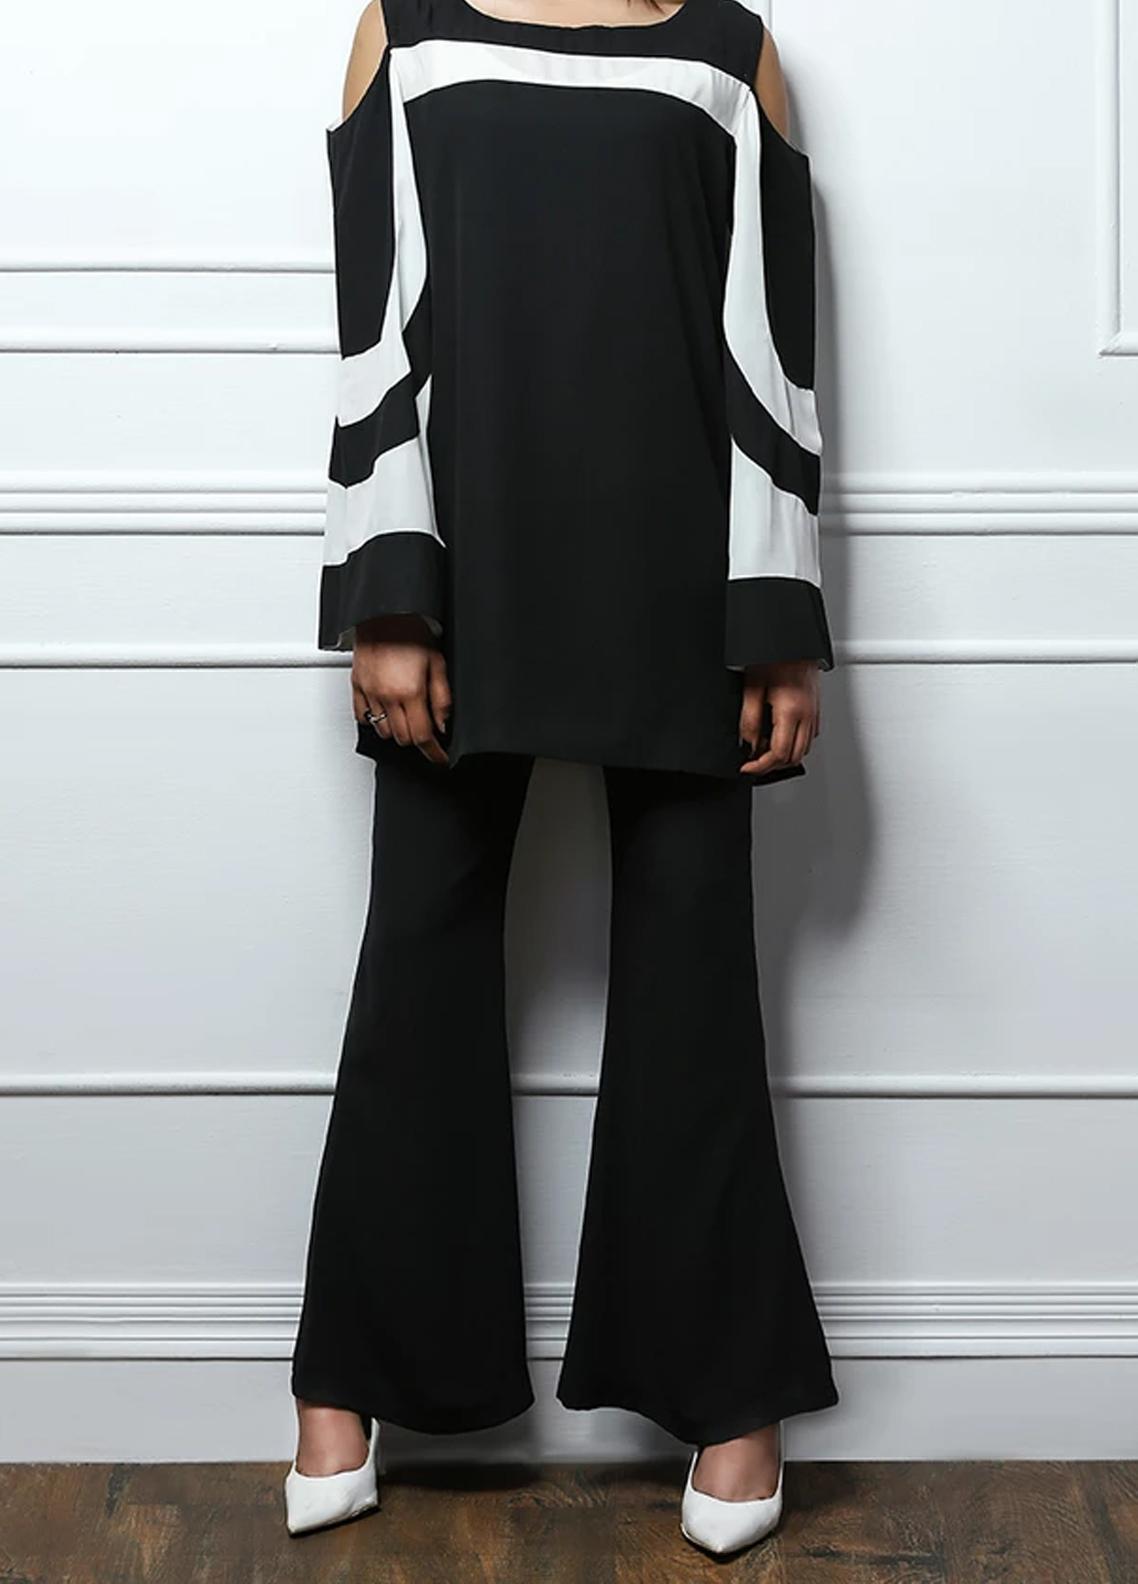 Pulsar Plain Georgette Stitched Trousers Fusion Trouser